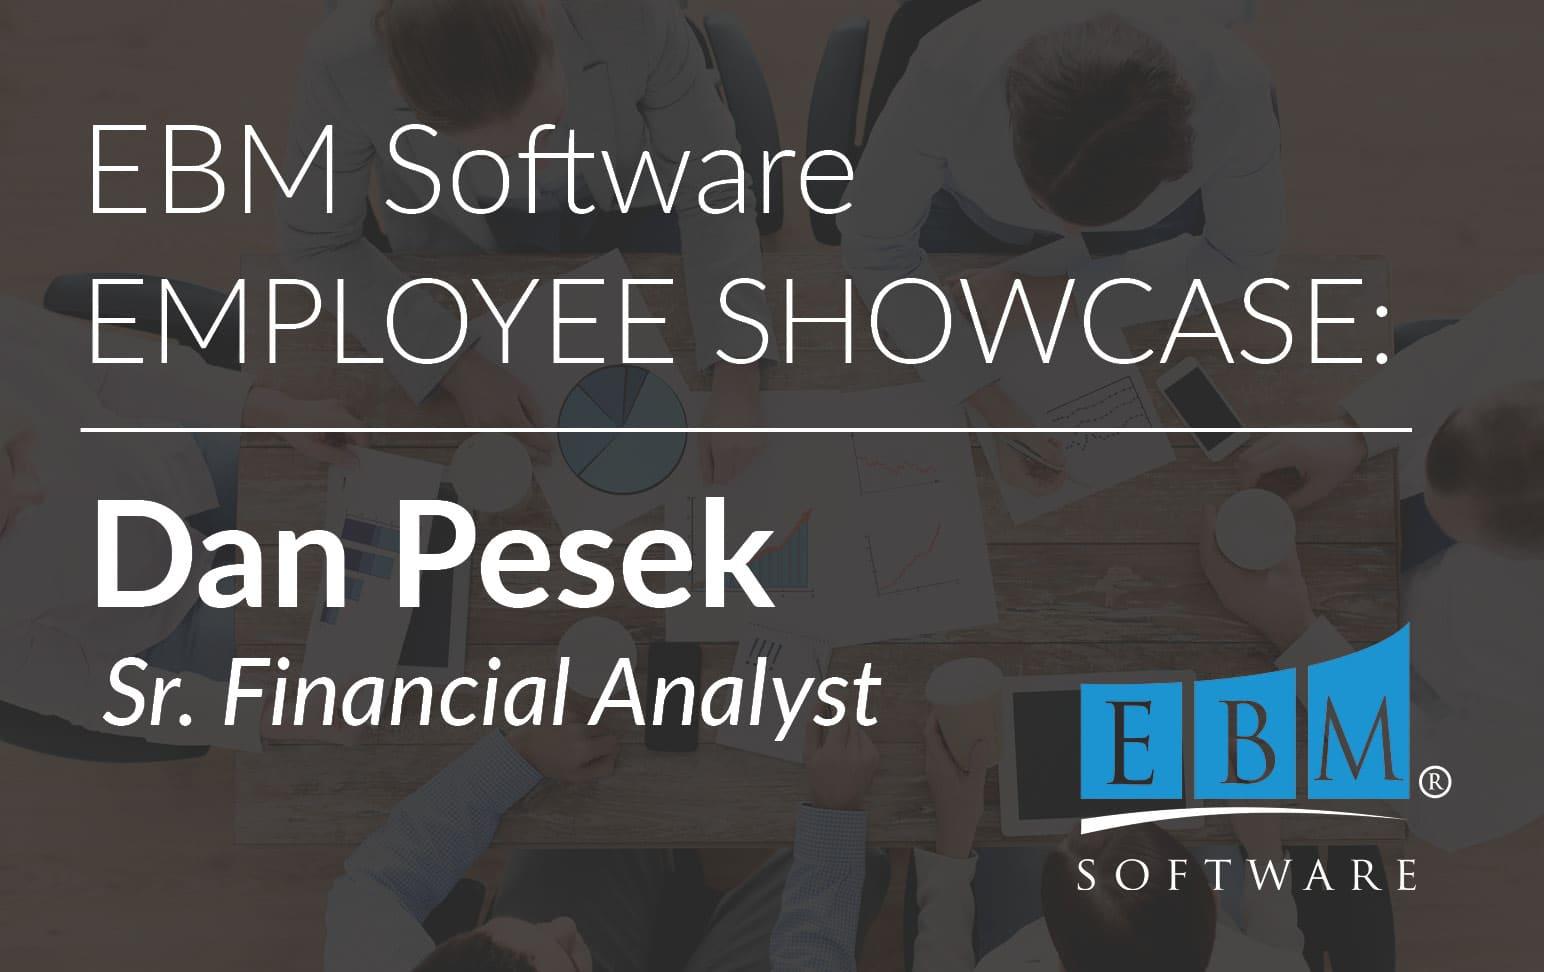 Employee Showcase – Dan Pesek